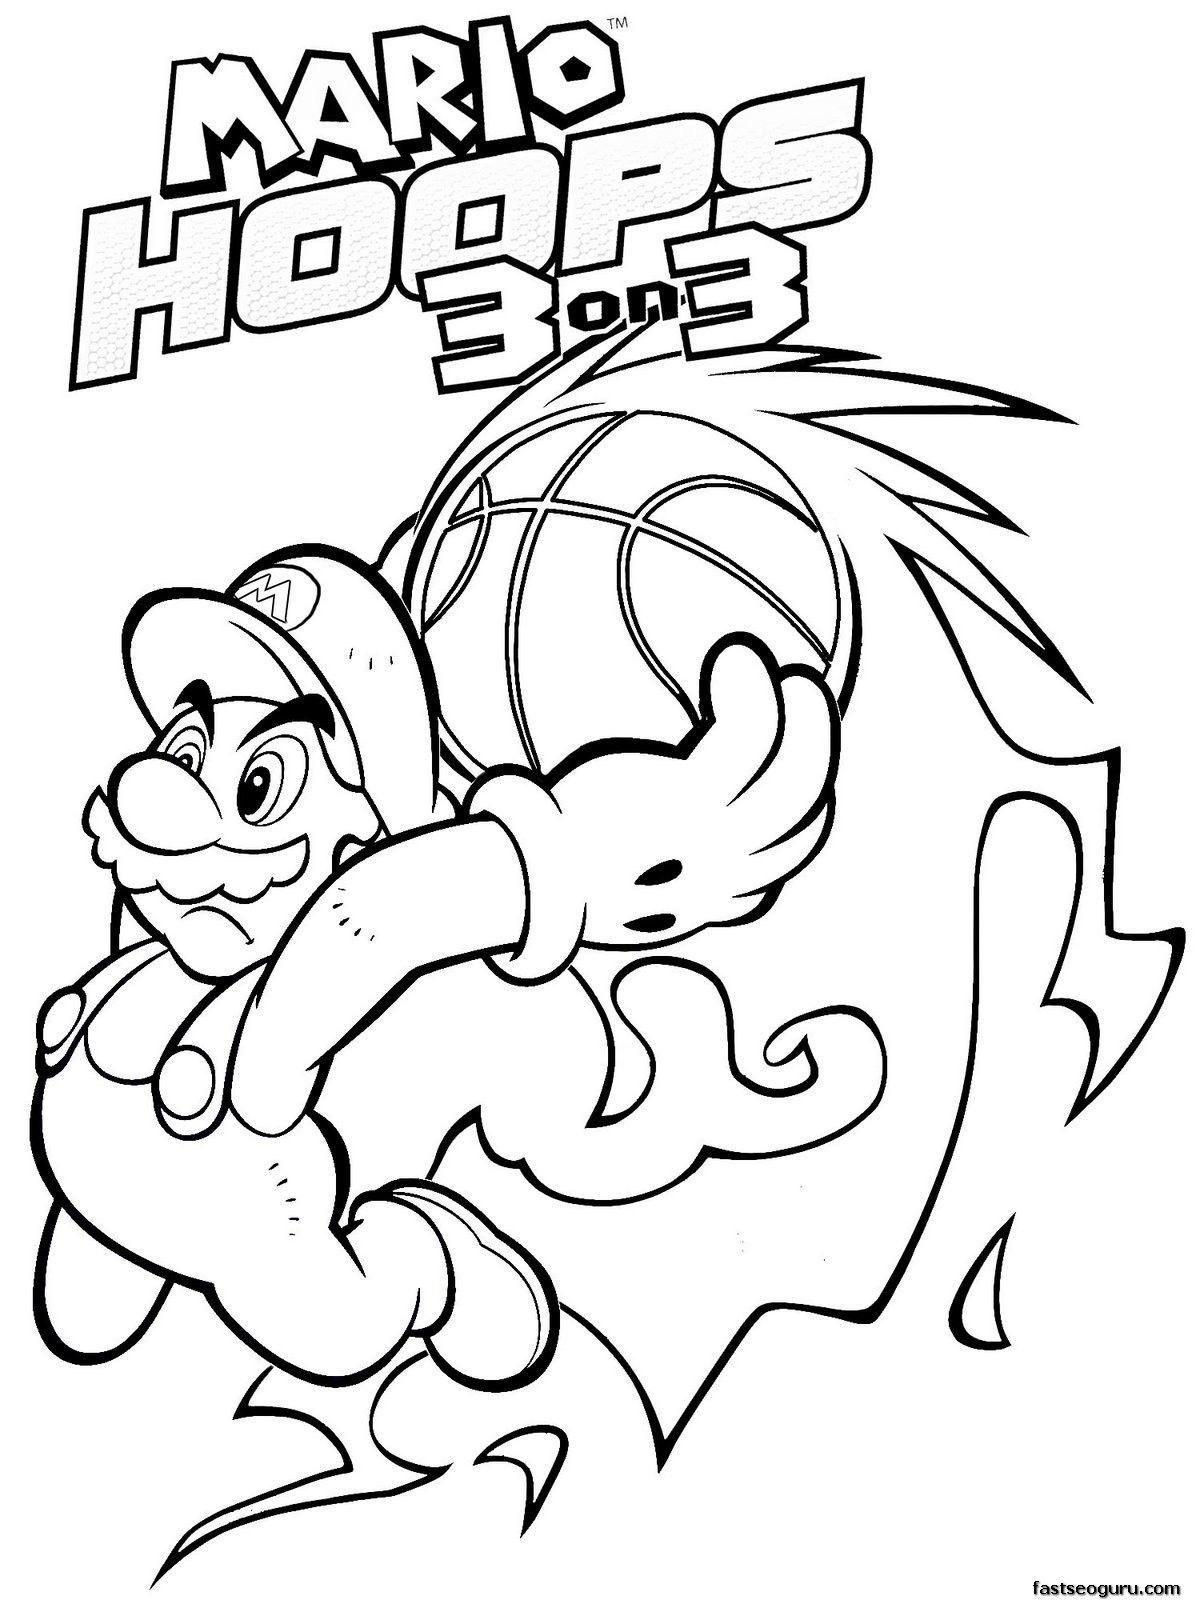 Super Mario Bros #204 (Video Games) – Printable coloring pages | 1600x1200